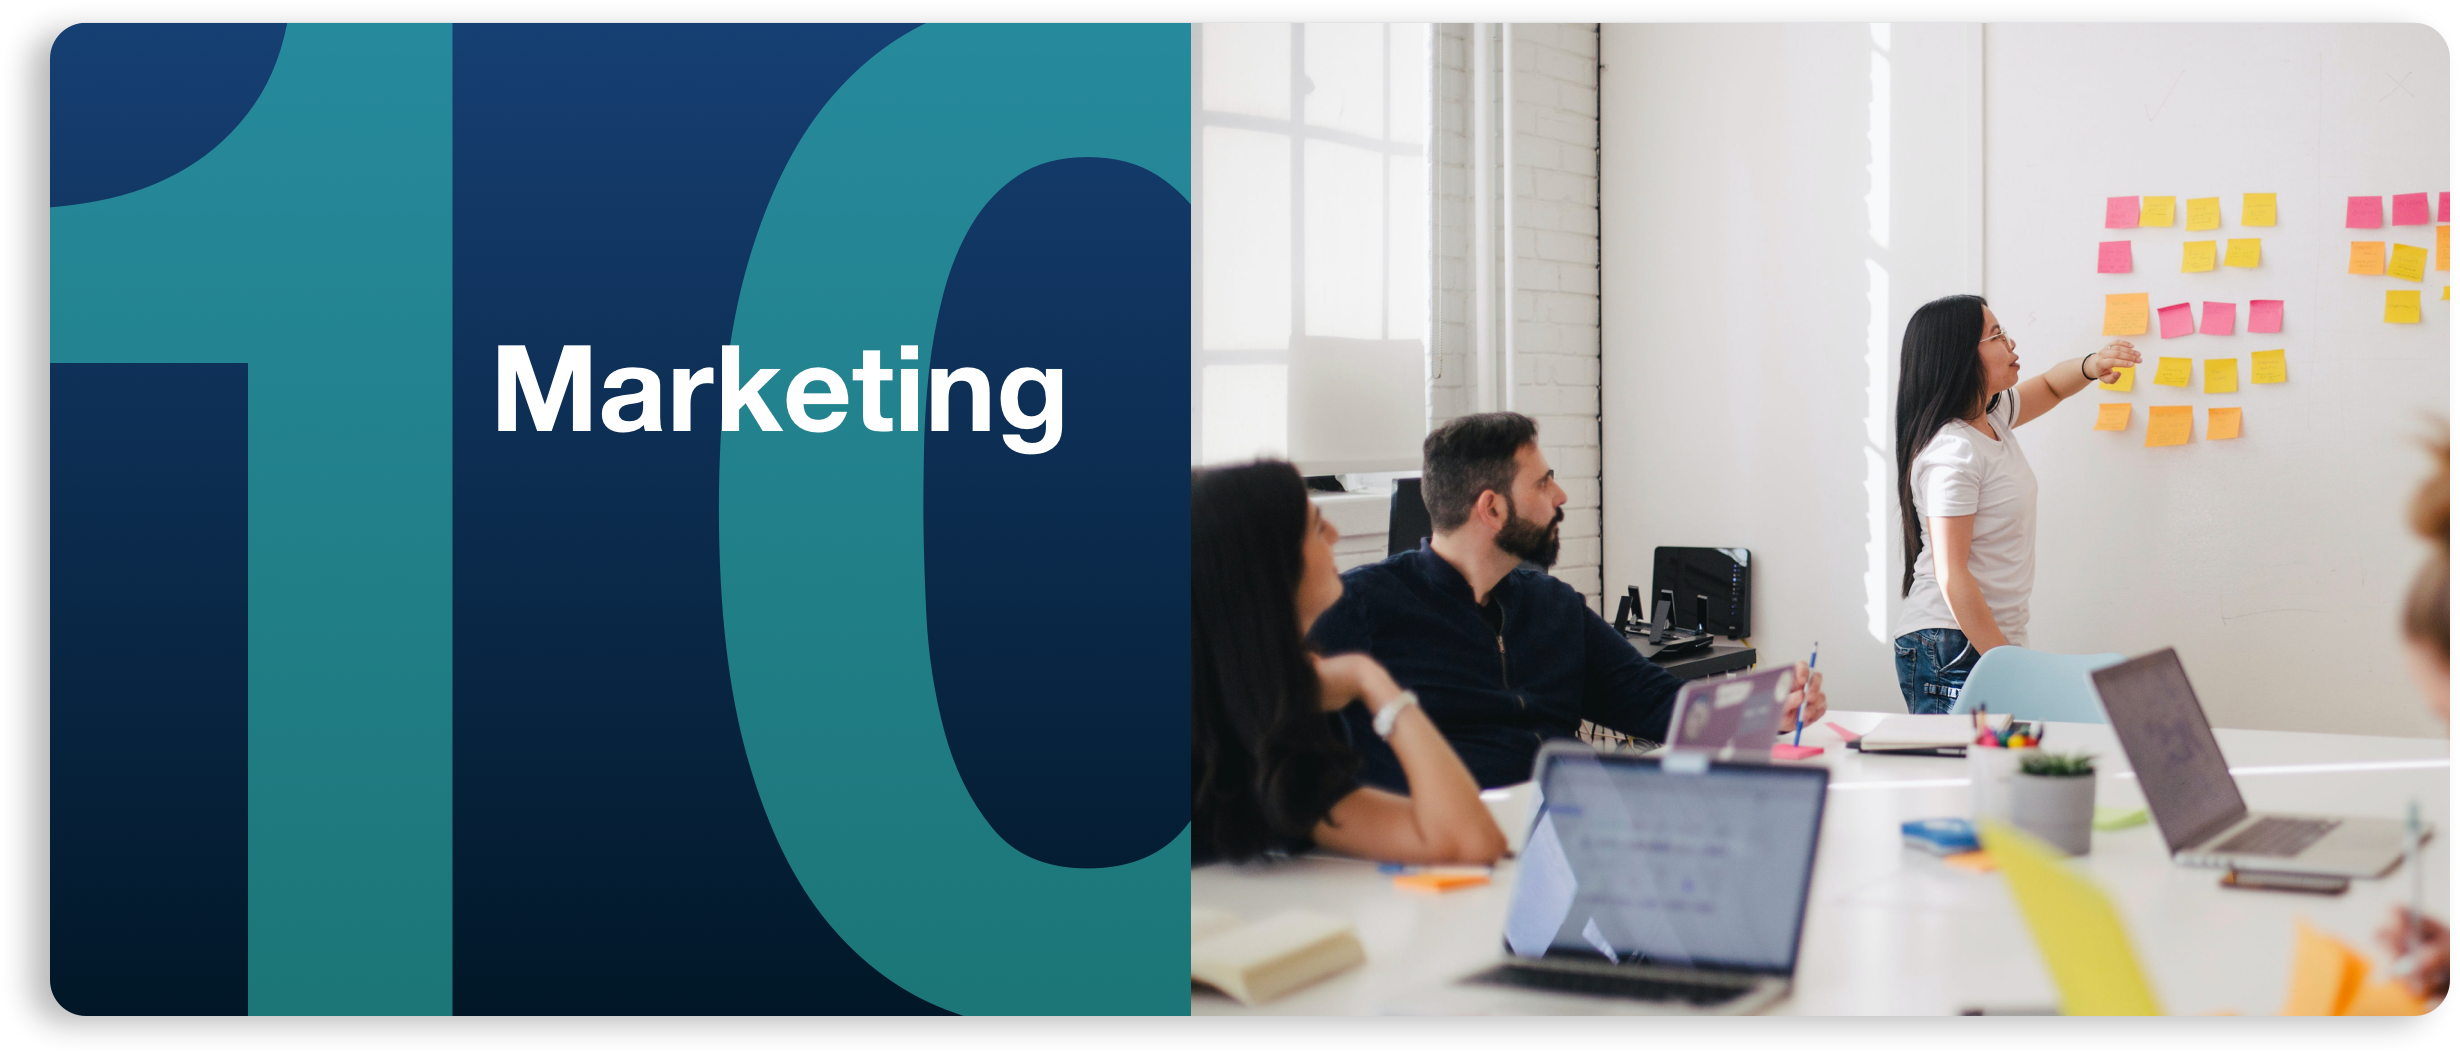 how-to-make-an-app-step-10-marketing